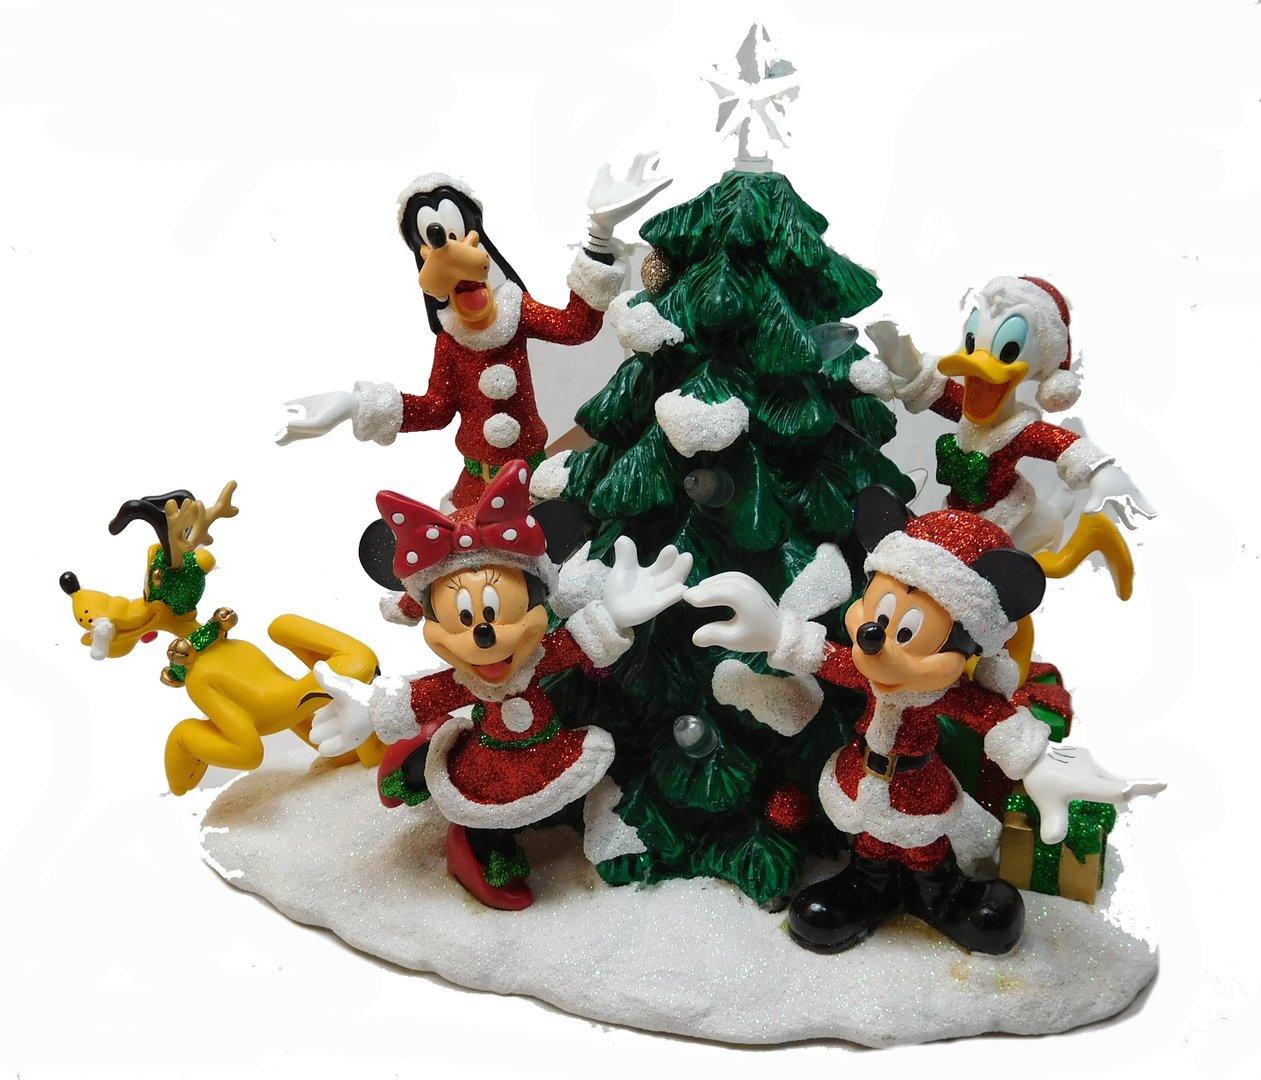 disney weihnachts diorama szene mickey minnie donald goofy. Black Bedroom Furniture Sets. Home Design Ideas